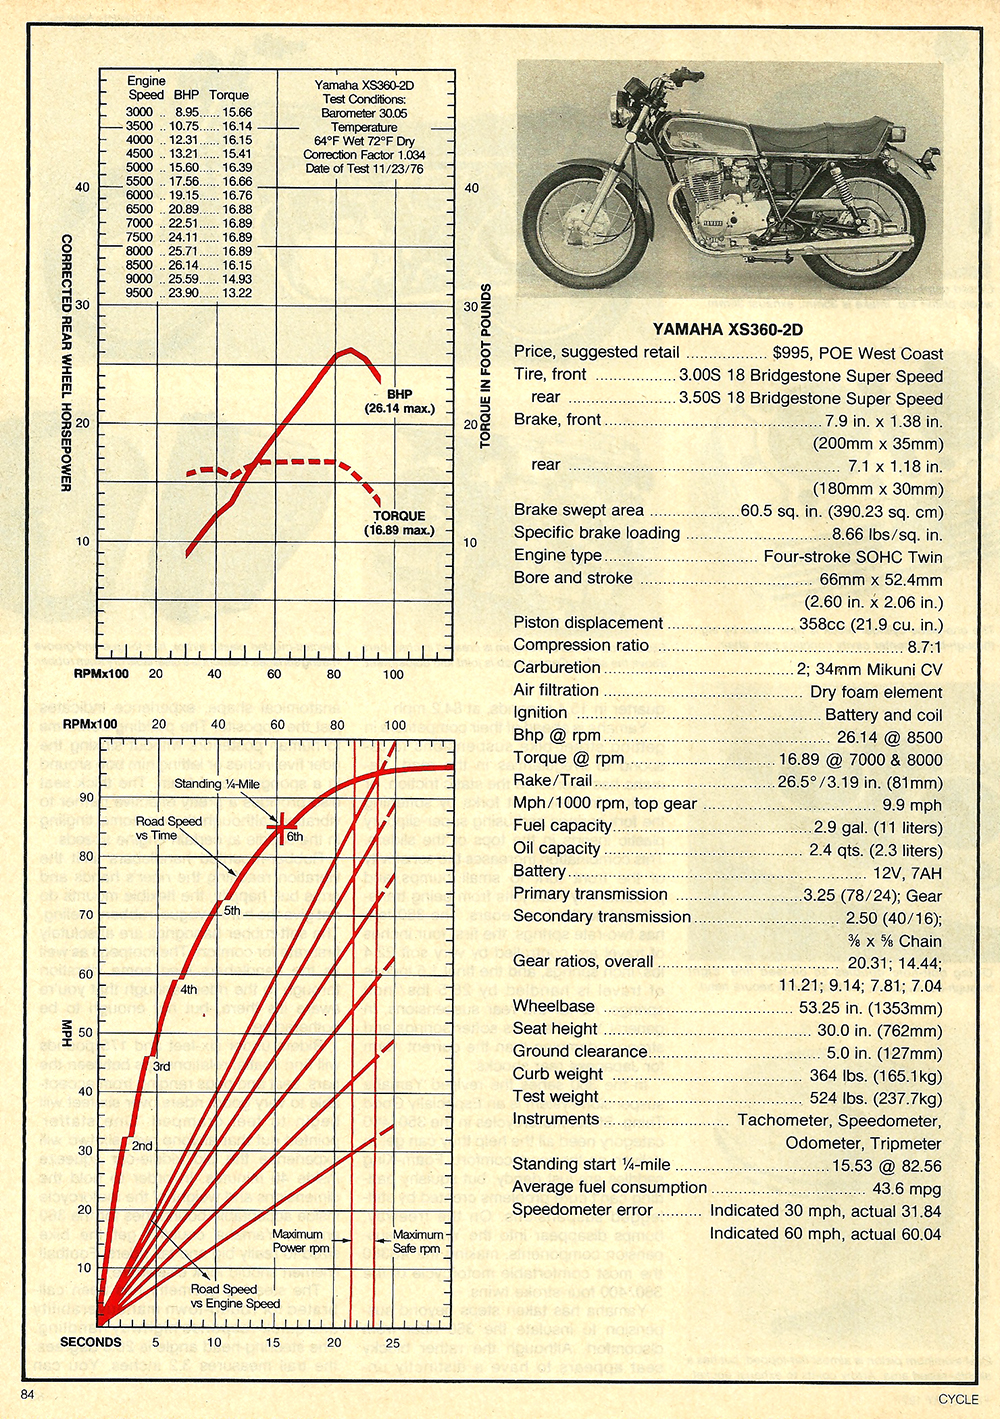 1977 Yamaha XS360-2D road test 4.jpg